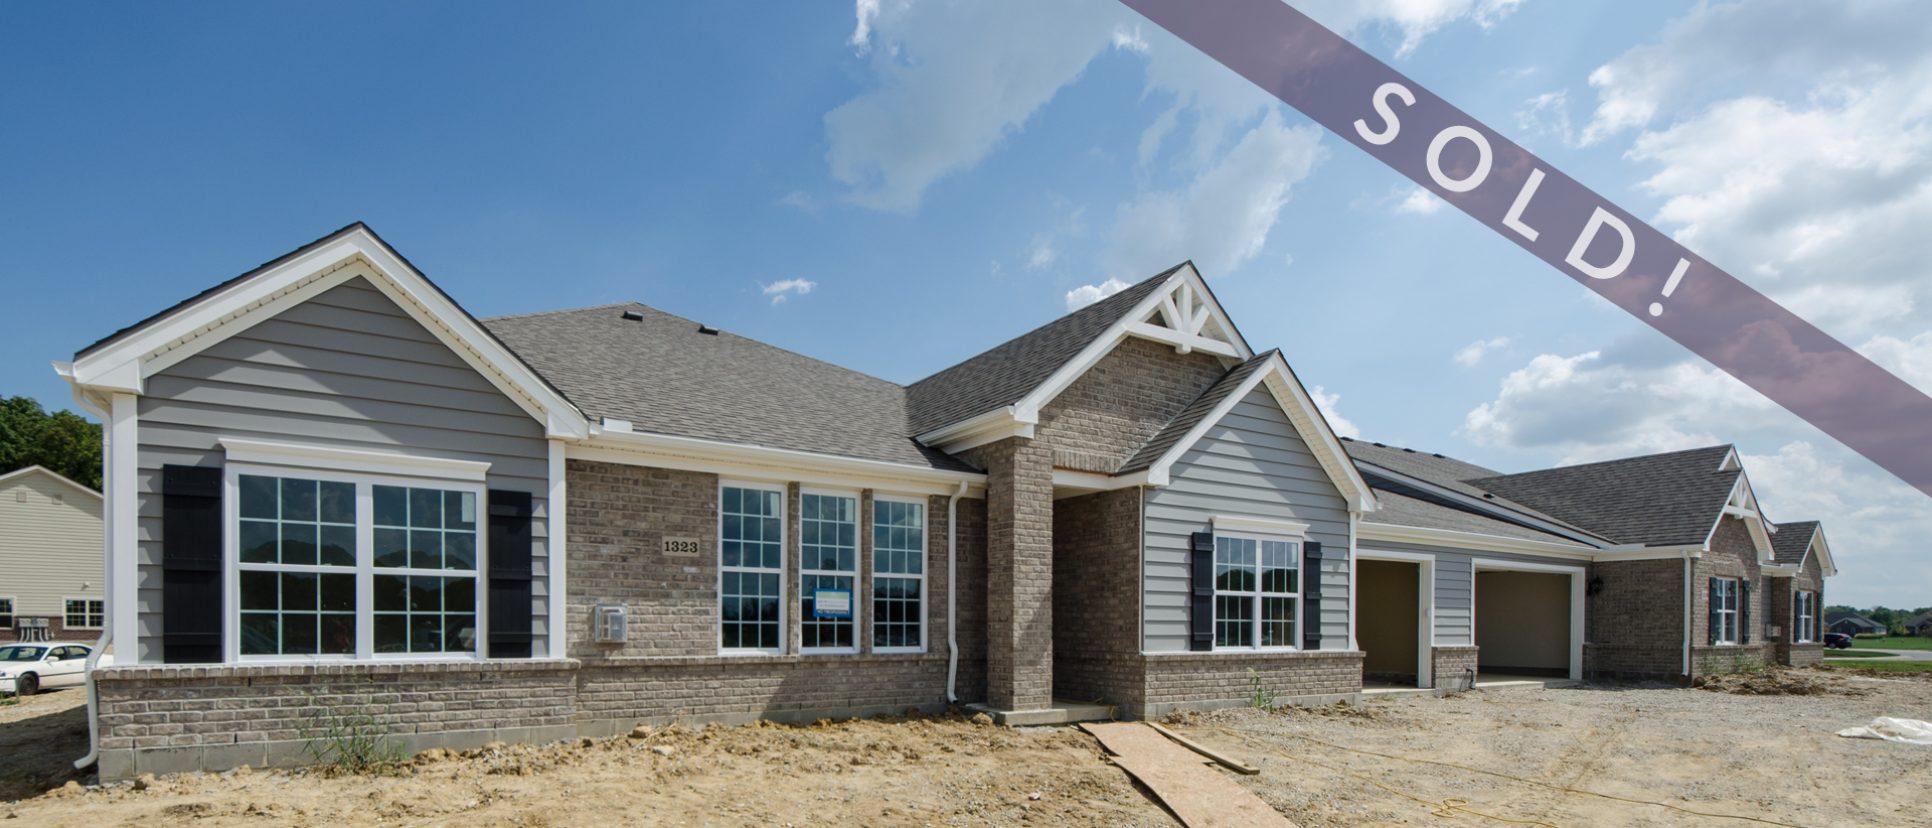 Custom exterior of The Abbington. A multi-family unit by Design Homes and Development.